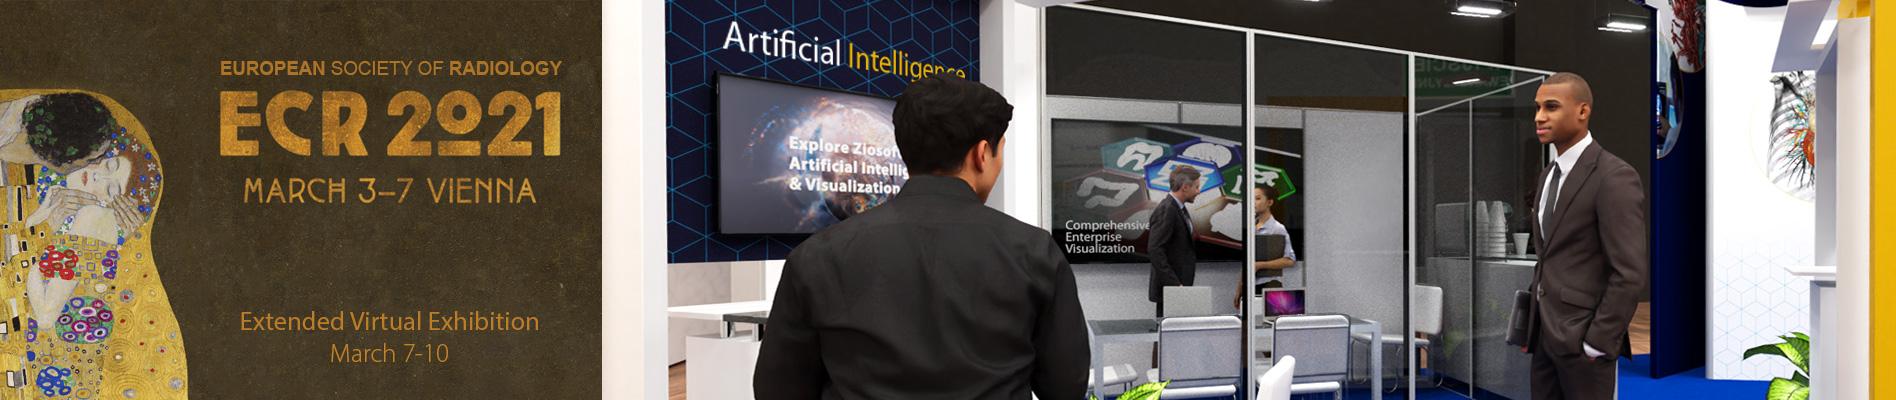 Ziosoft ECR2021 booth image